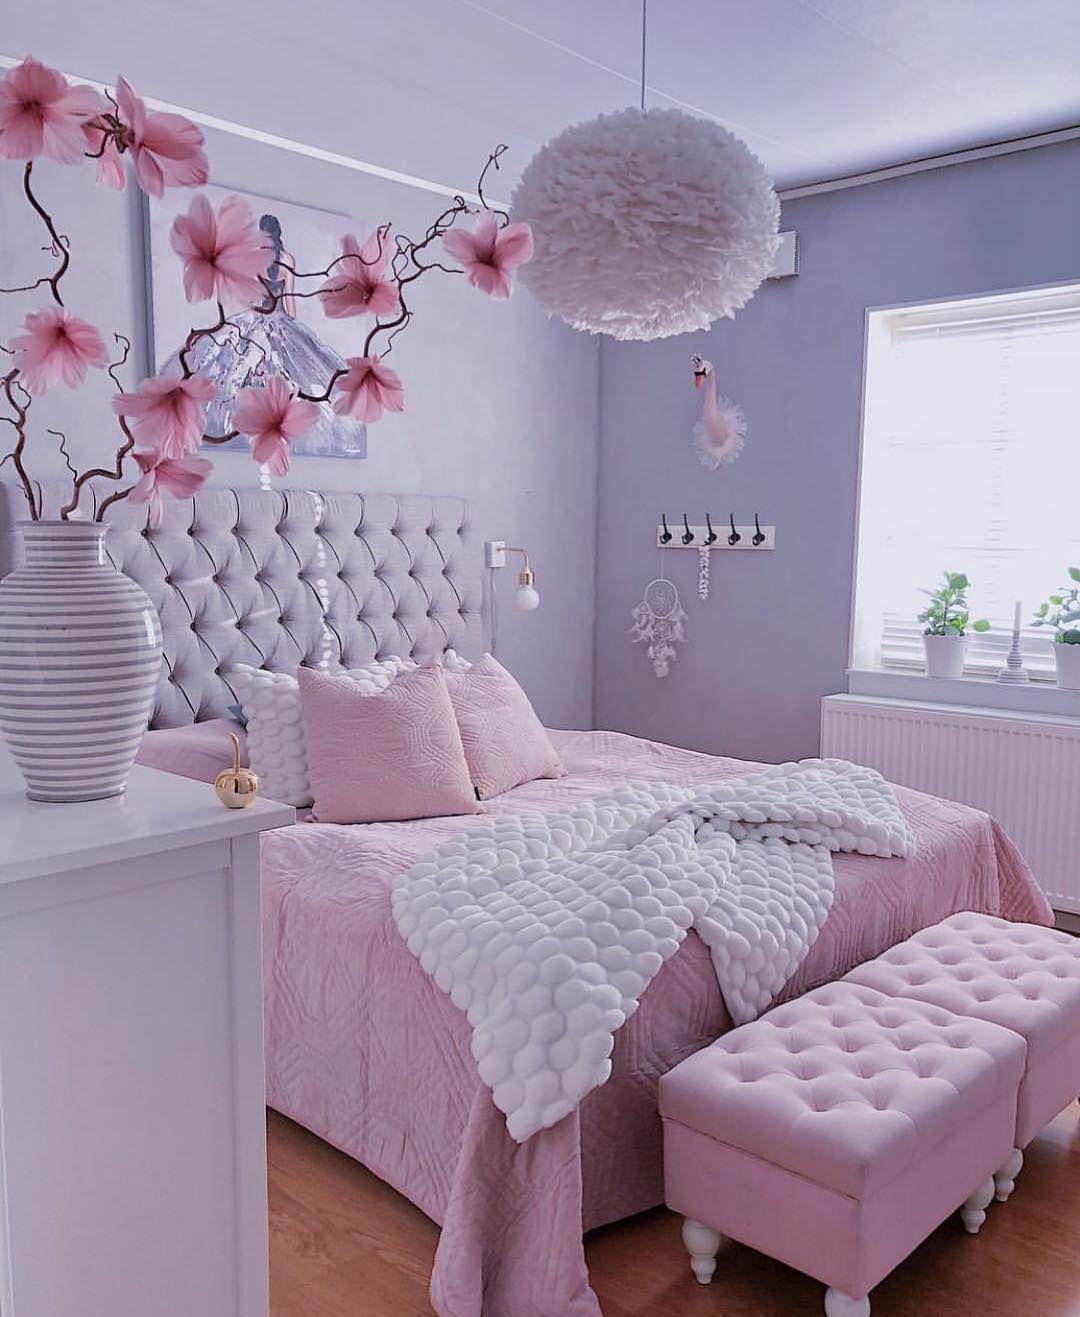 The perfectly sweet bedroom. Exclusive bedding from Royfort. #bedding #sleep #bedroom